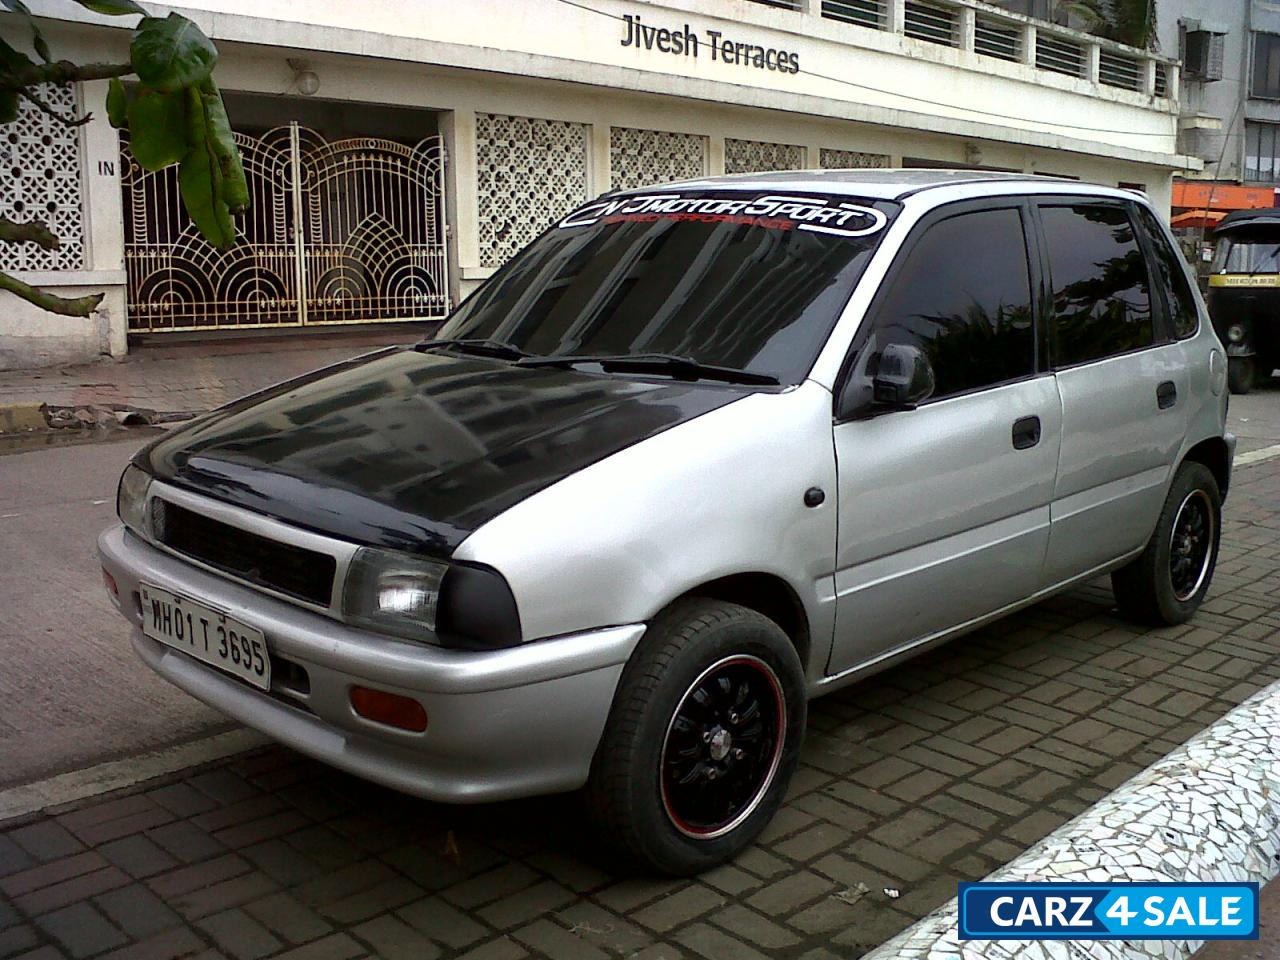 Zen Cars For Sale In Bangalore: Suzuki Zen Vxi For Sale Bangalore Cars Maruthi